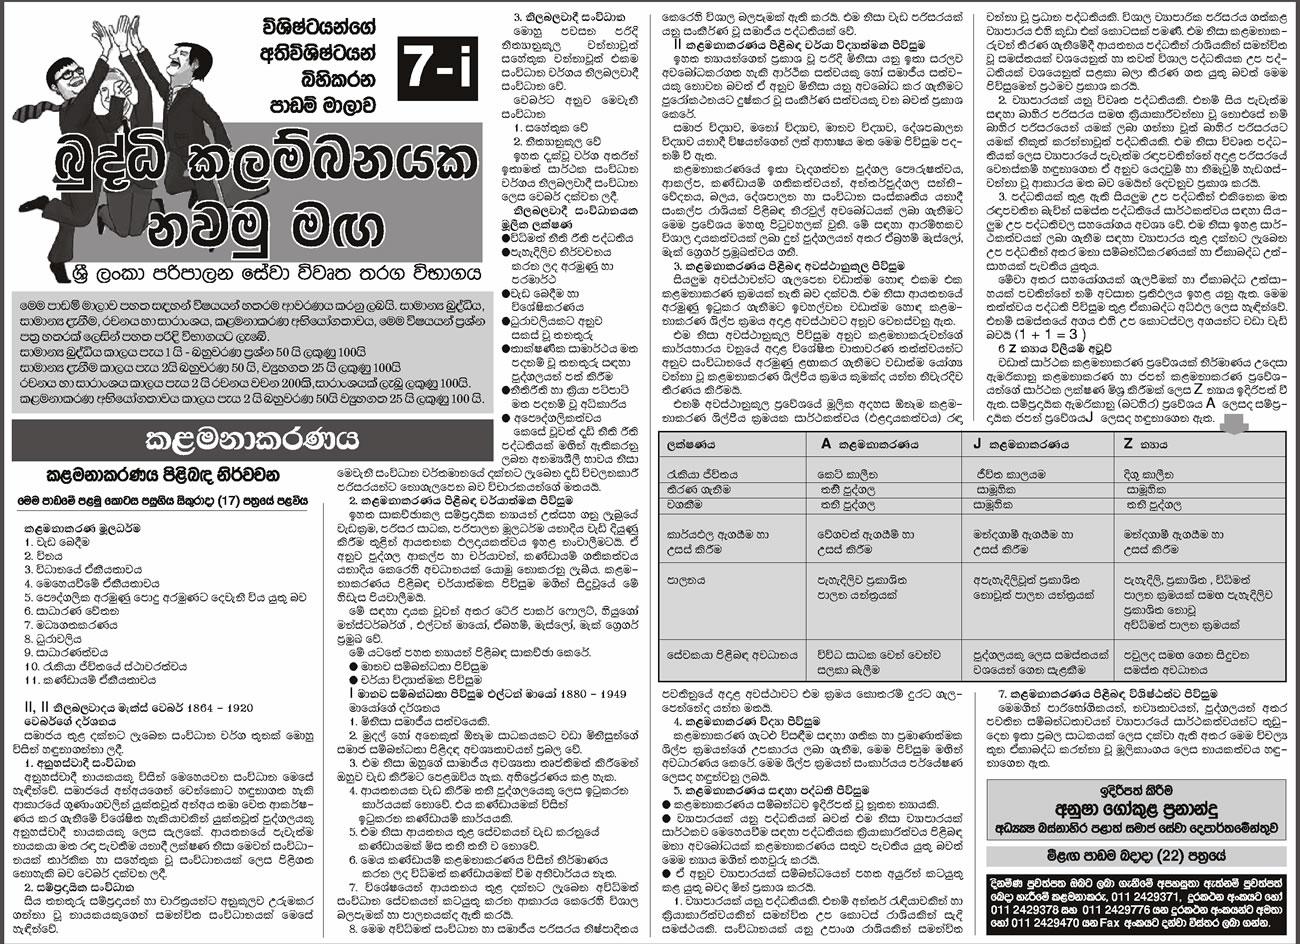 SLAS Exam Guide - Paripalana Sewa - Lesson 07 part i